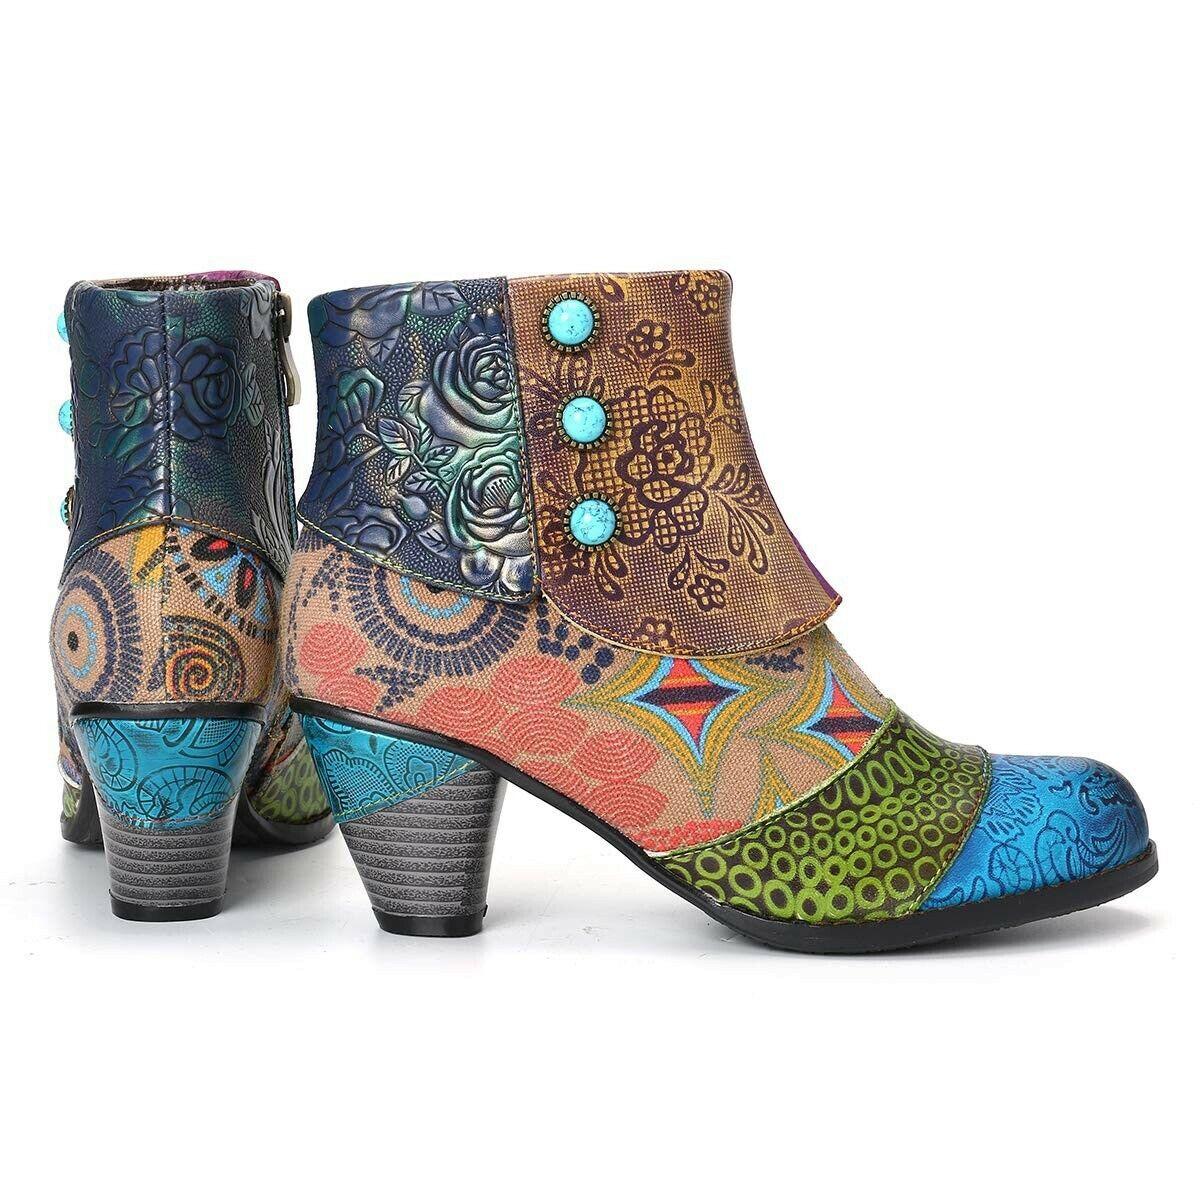 Women's Ankle Boots Cowboy Cowgirl Western Cuban heel retro Bootie Round Toe Zip